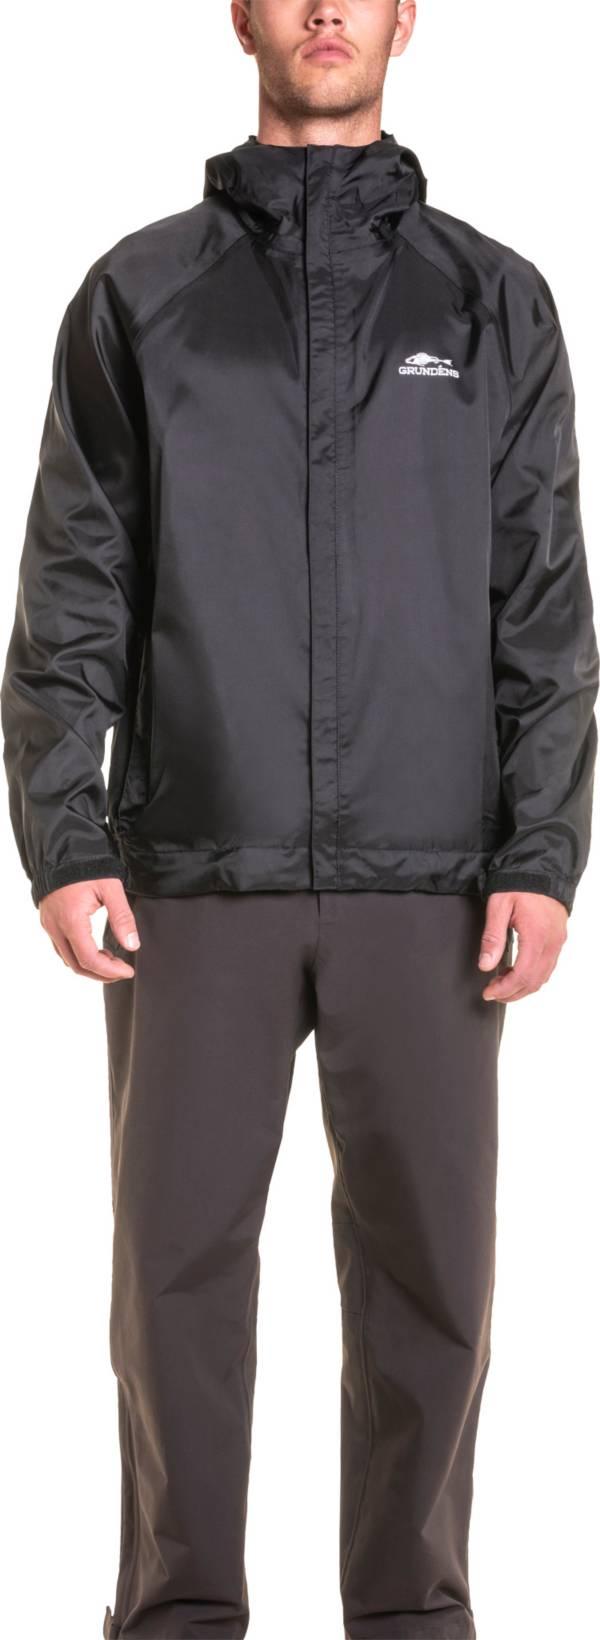 Grundéns Men's Weather Watch Jacket product image